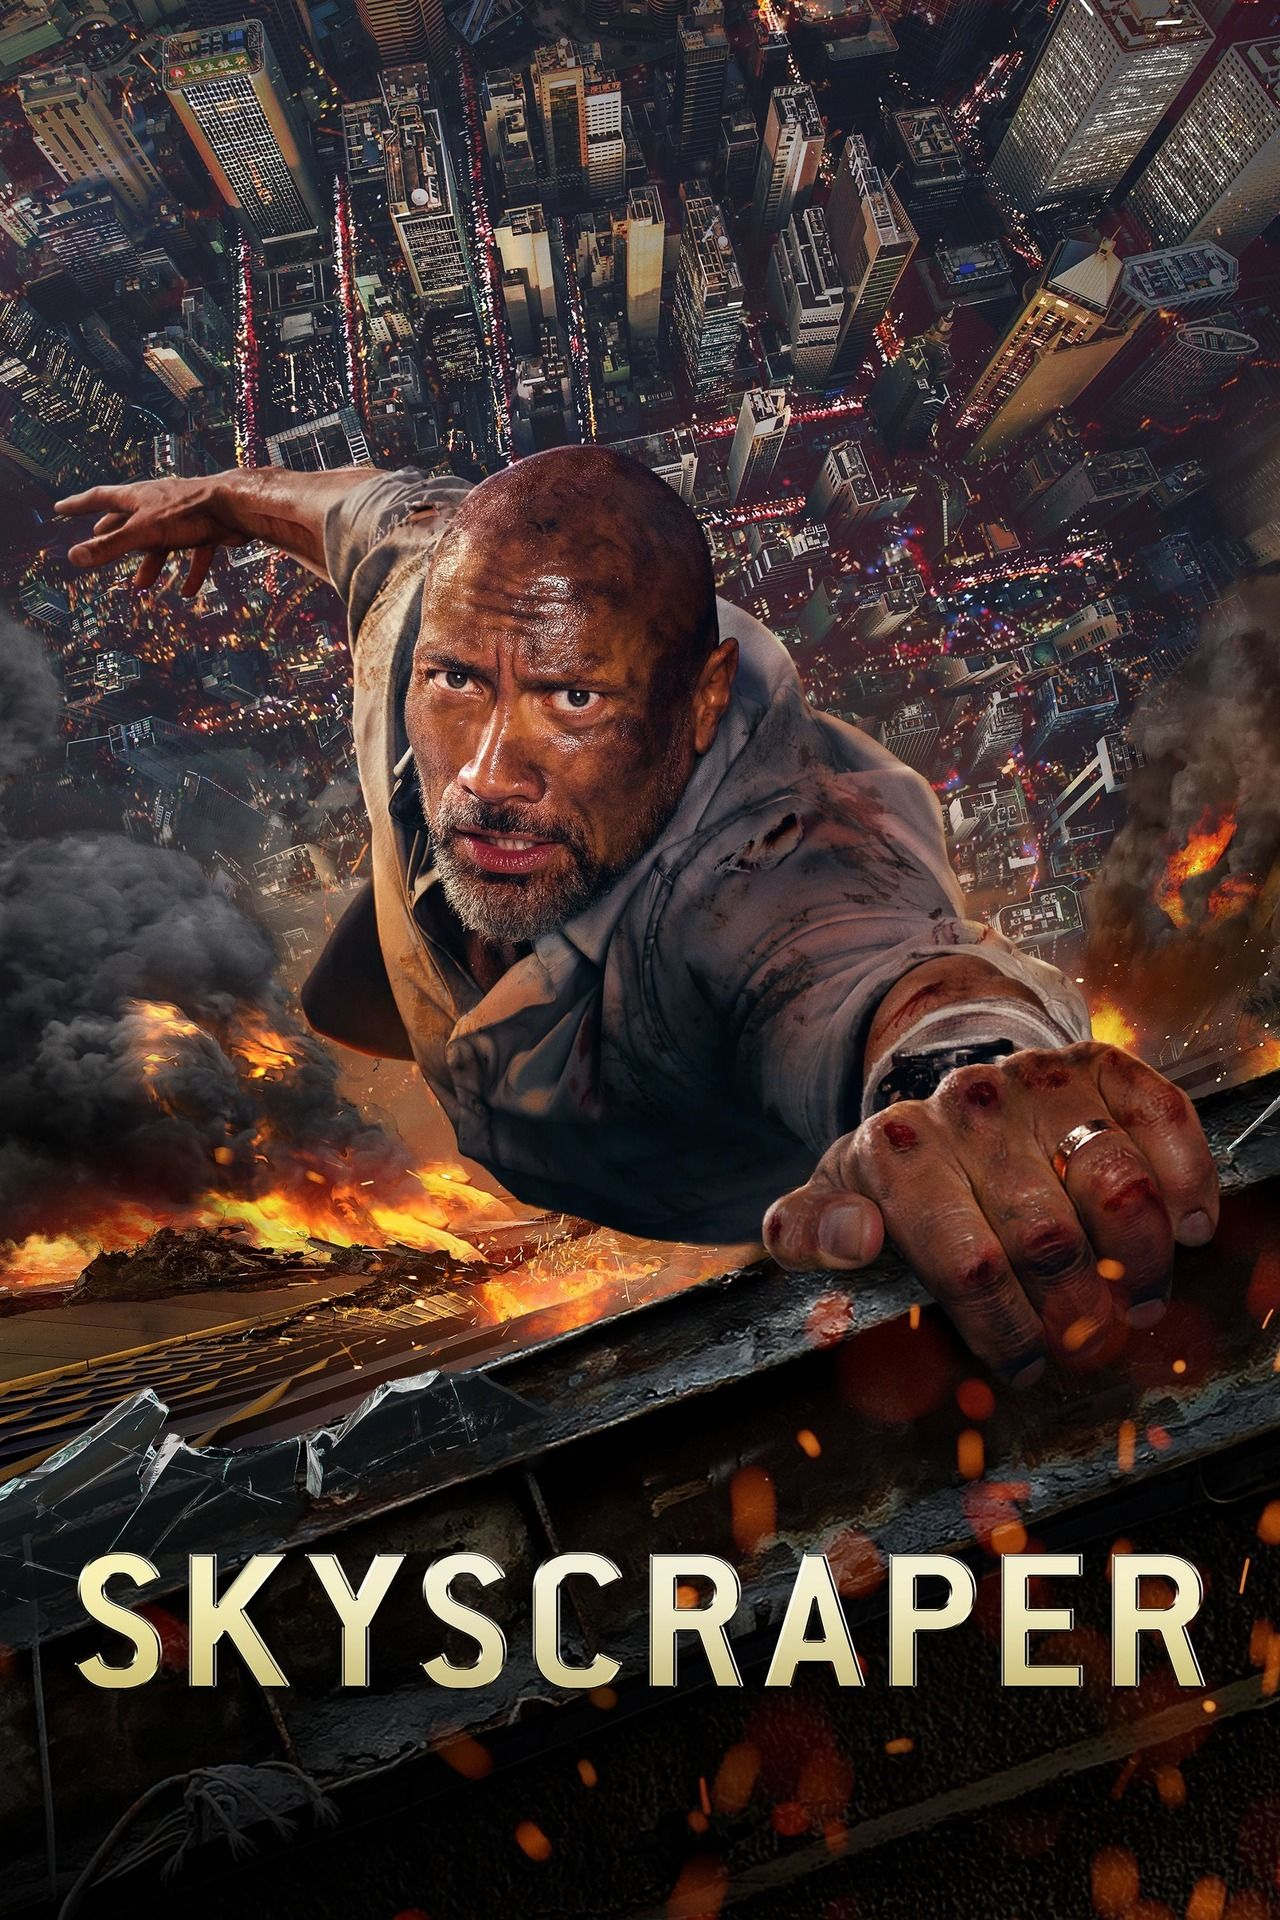 Skyscraper Movie Poster Photo 8x10 11x17 16x20 22x28 24x36 27x40 The Rock A